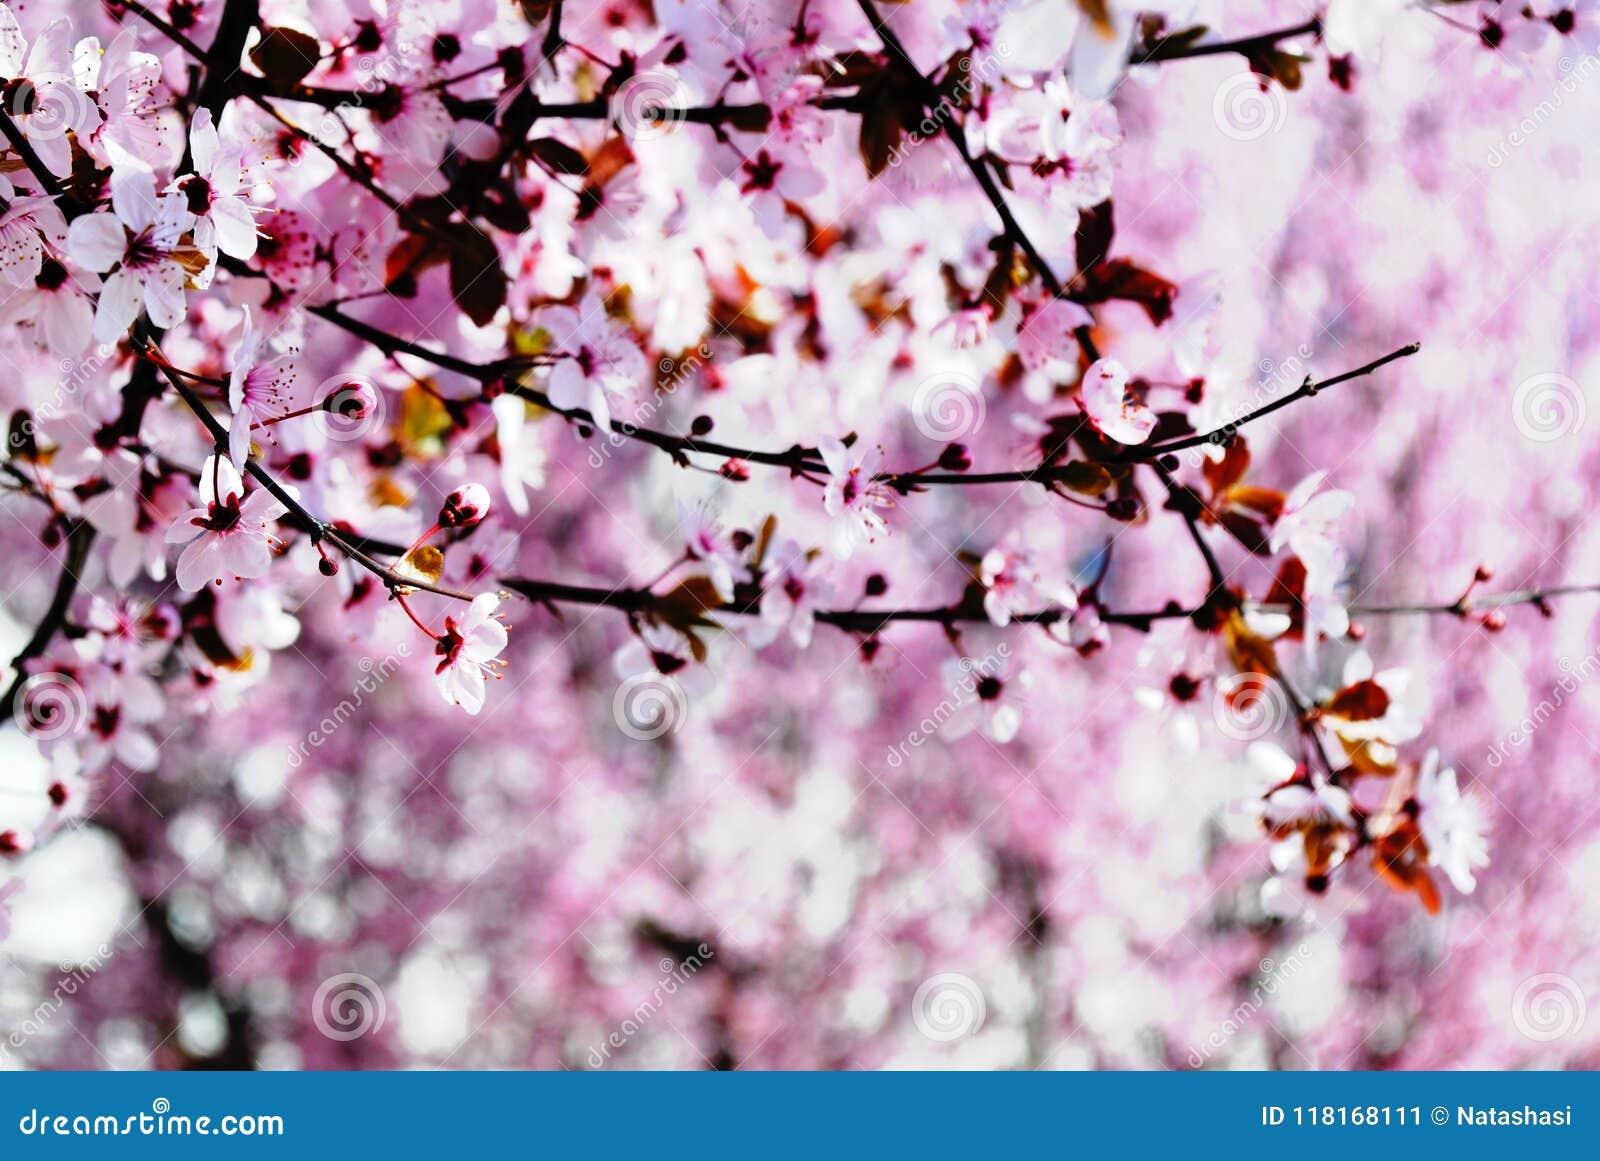 Сакура какой цвет